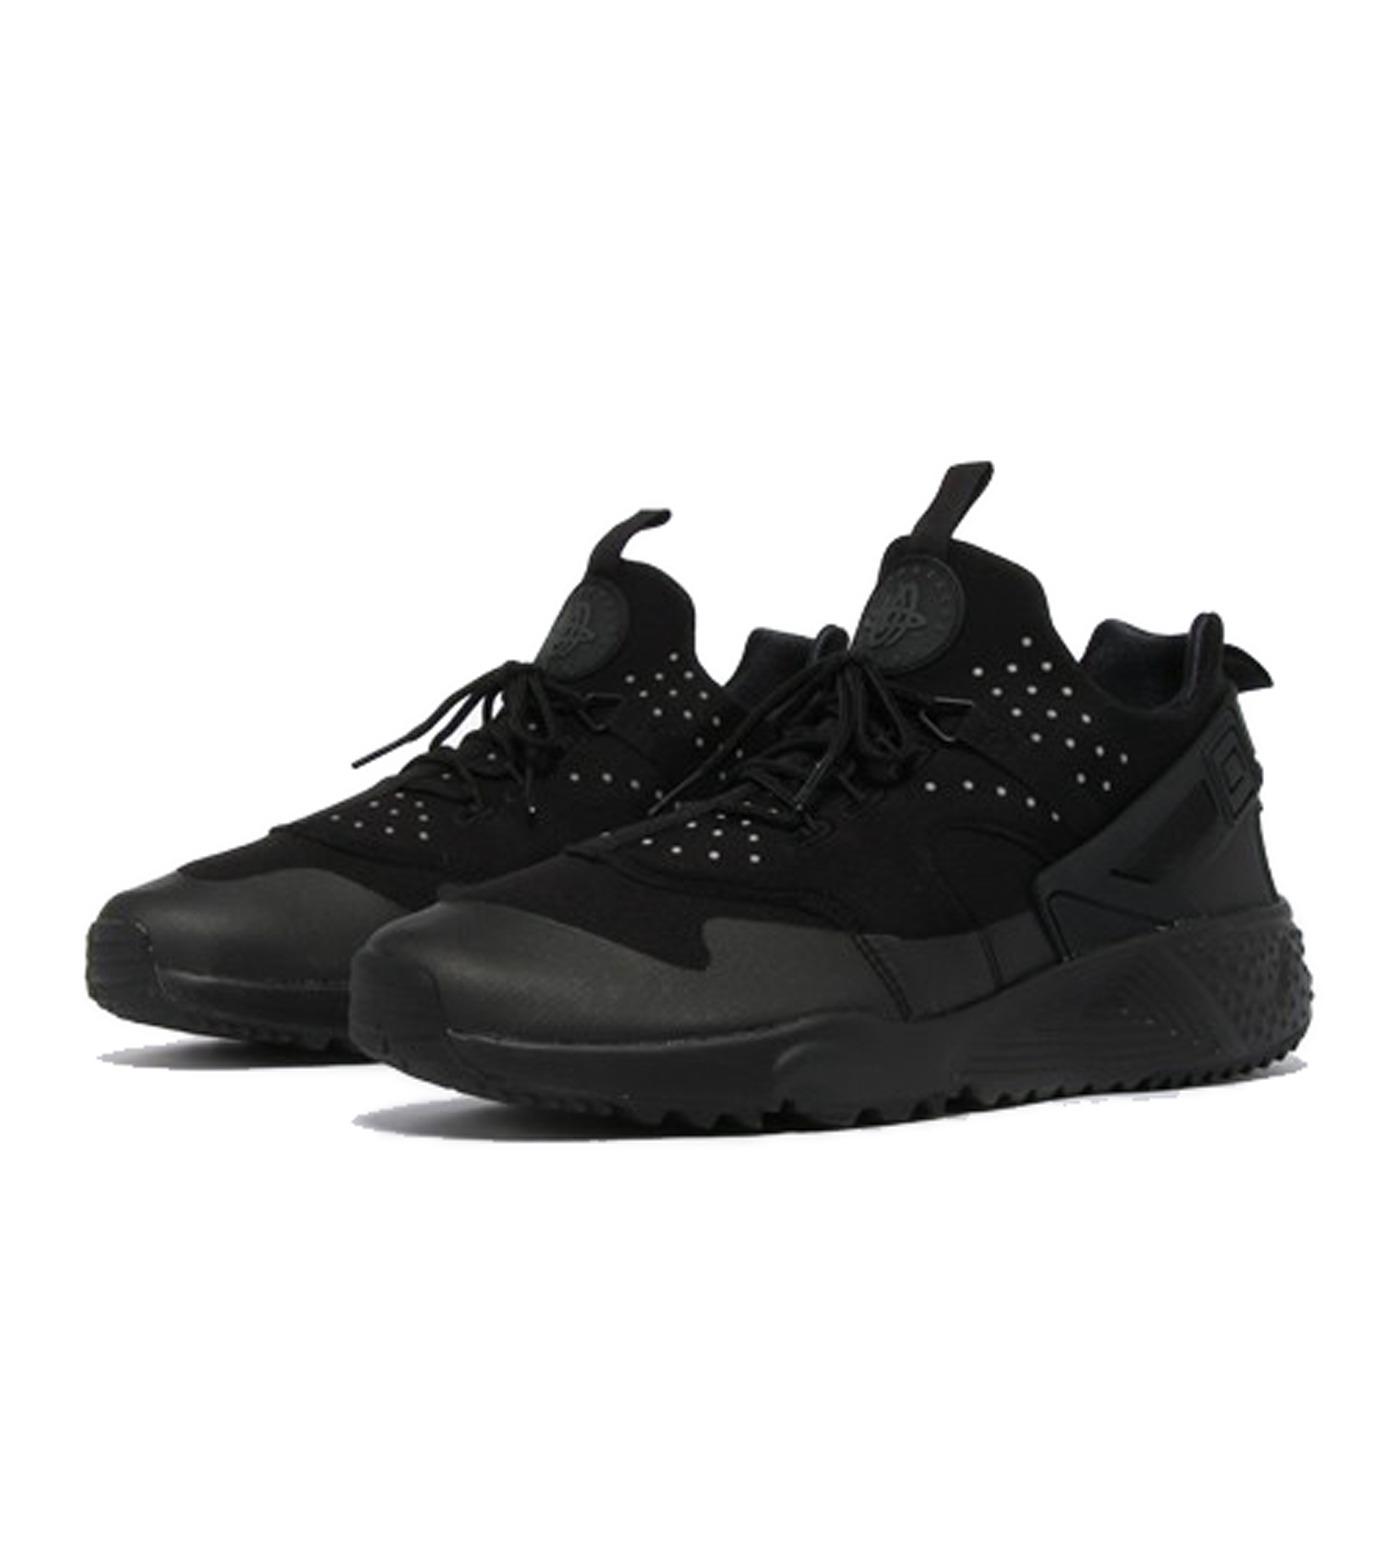 NIKE(ナイキ)のAIR HUARACHE 2/3-BLACK(シューズ/shoes)-806807-002-13 拡大詳細画像3